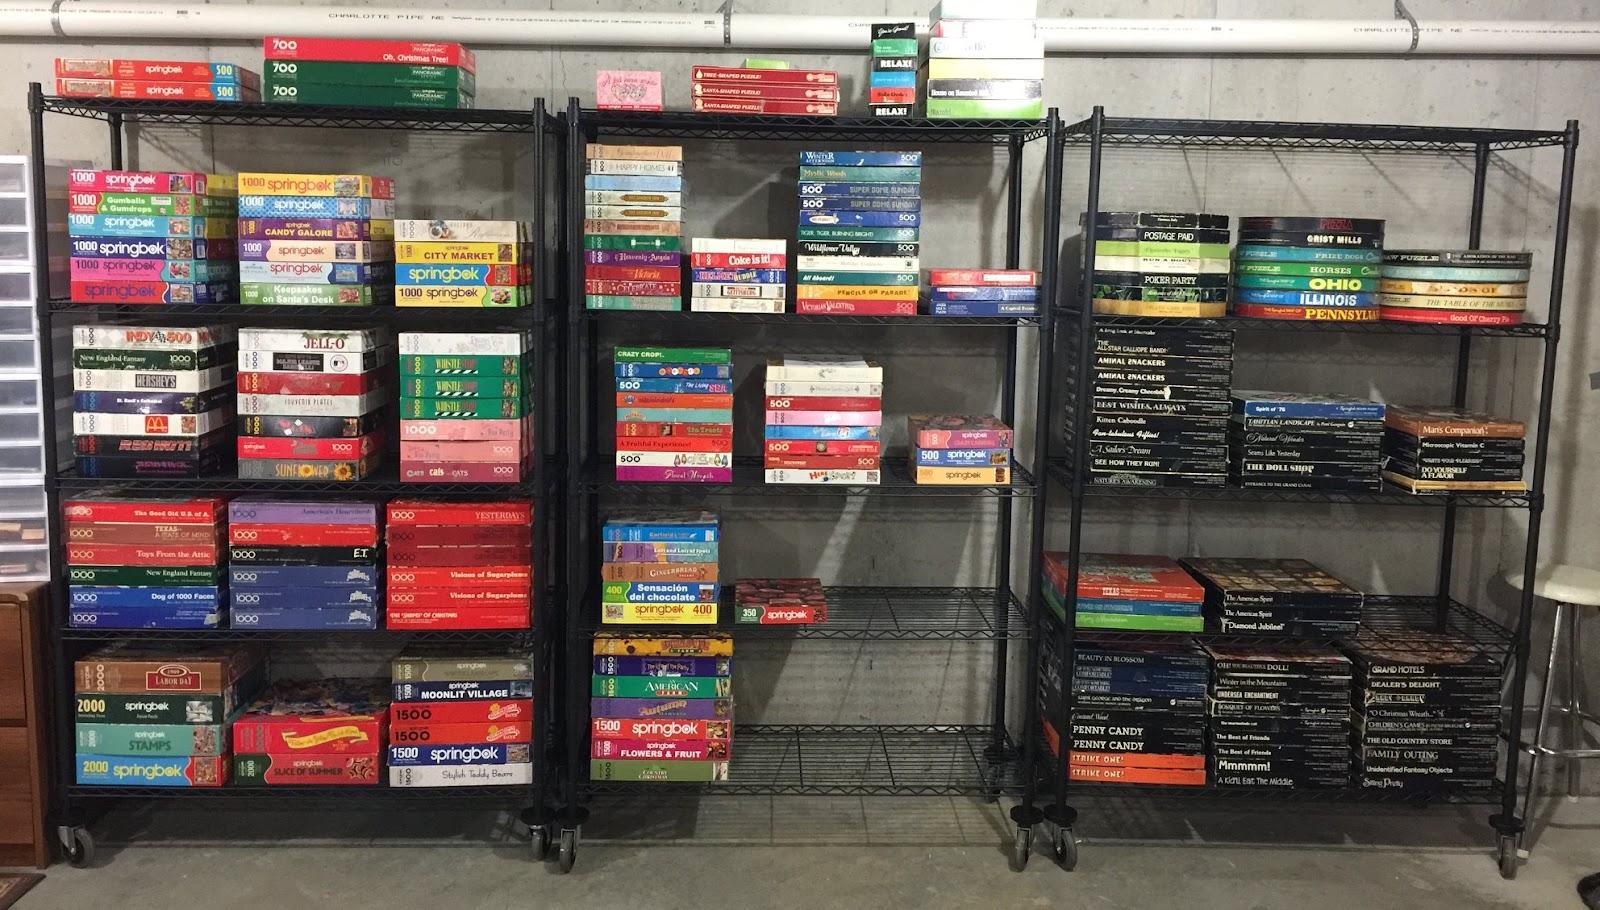 Planchak's large puzzle collection on shelves.